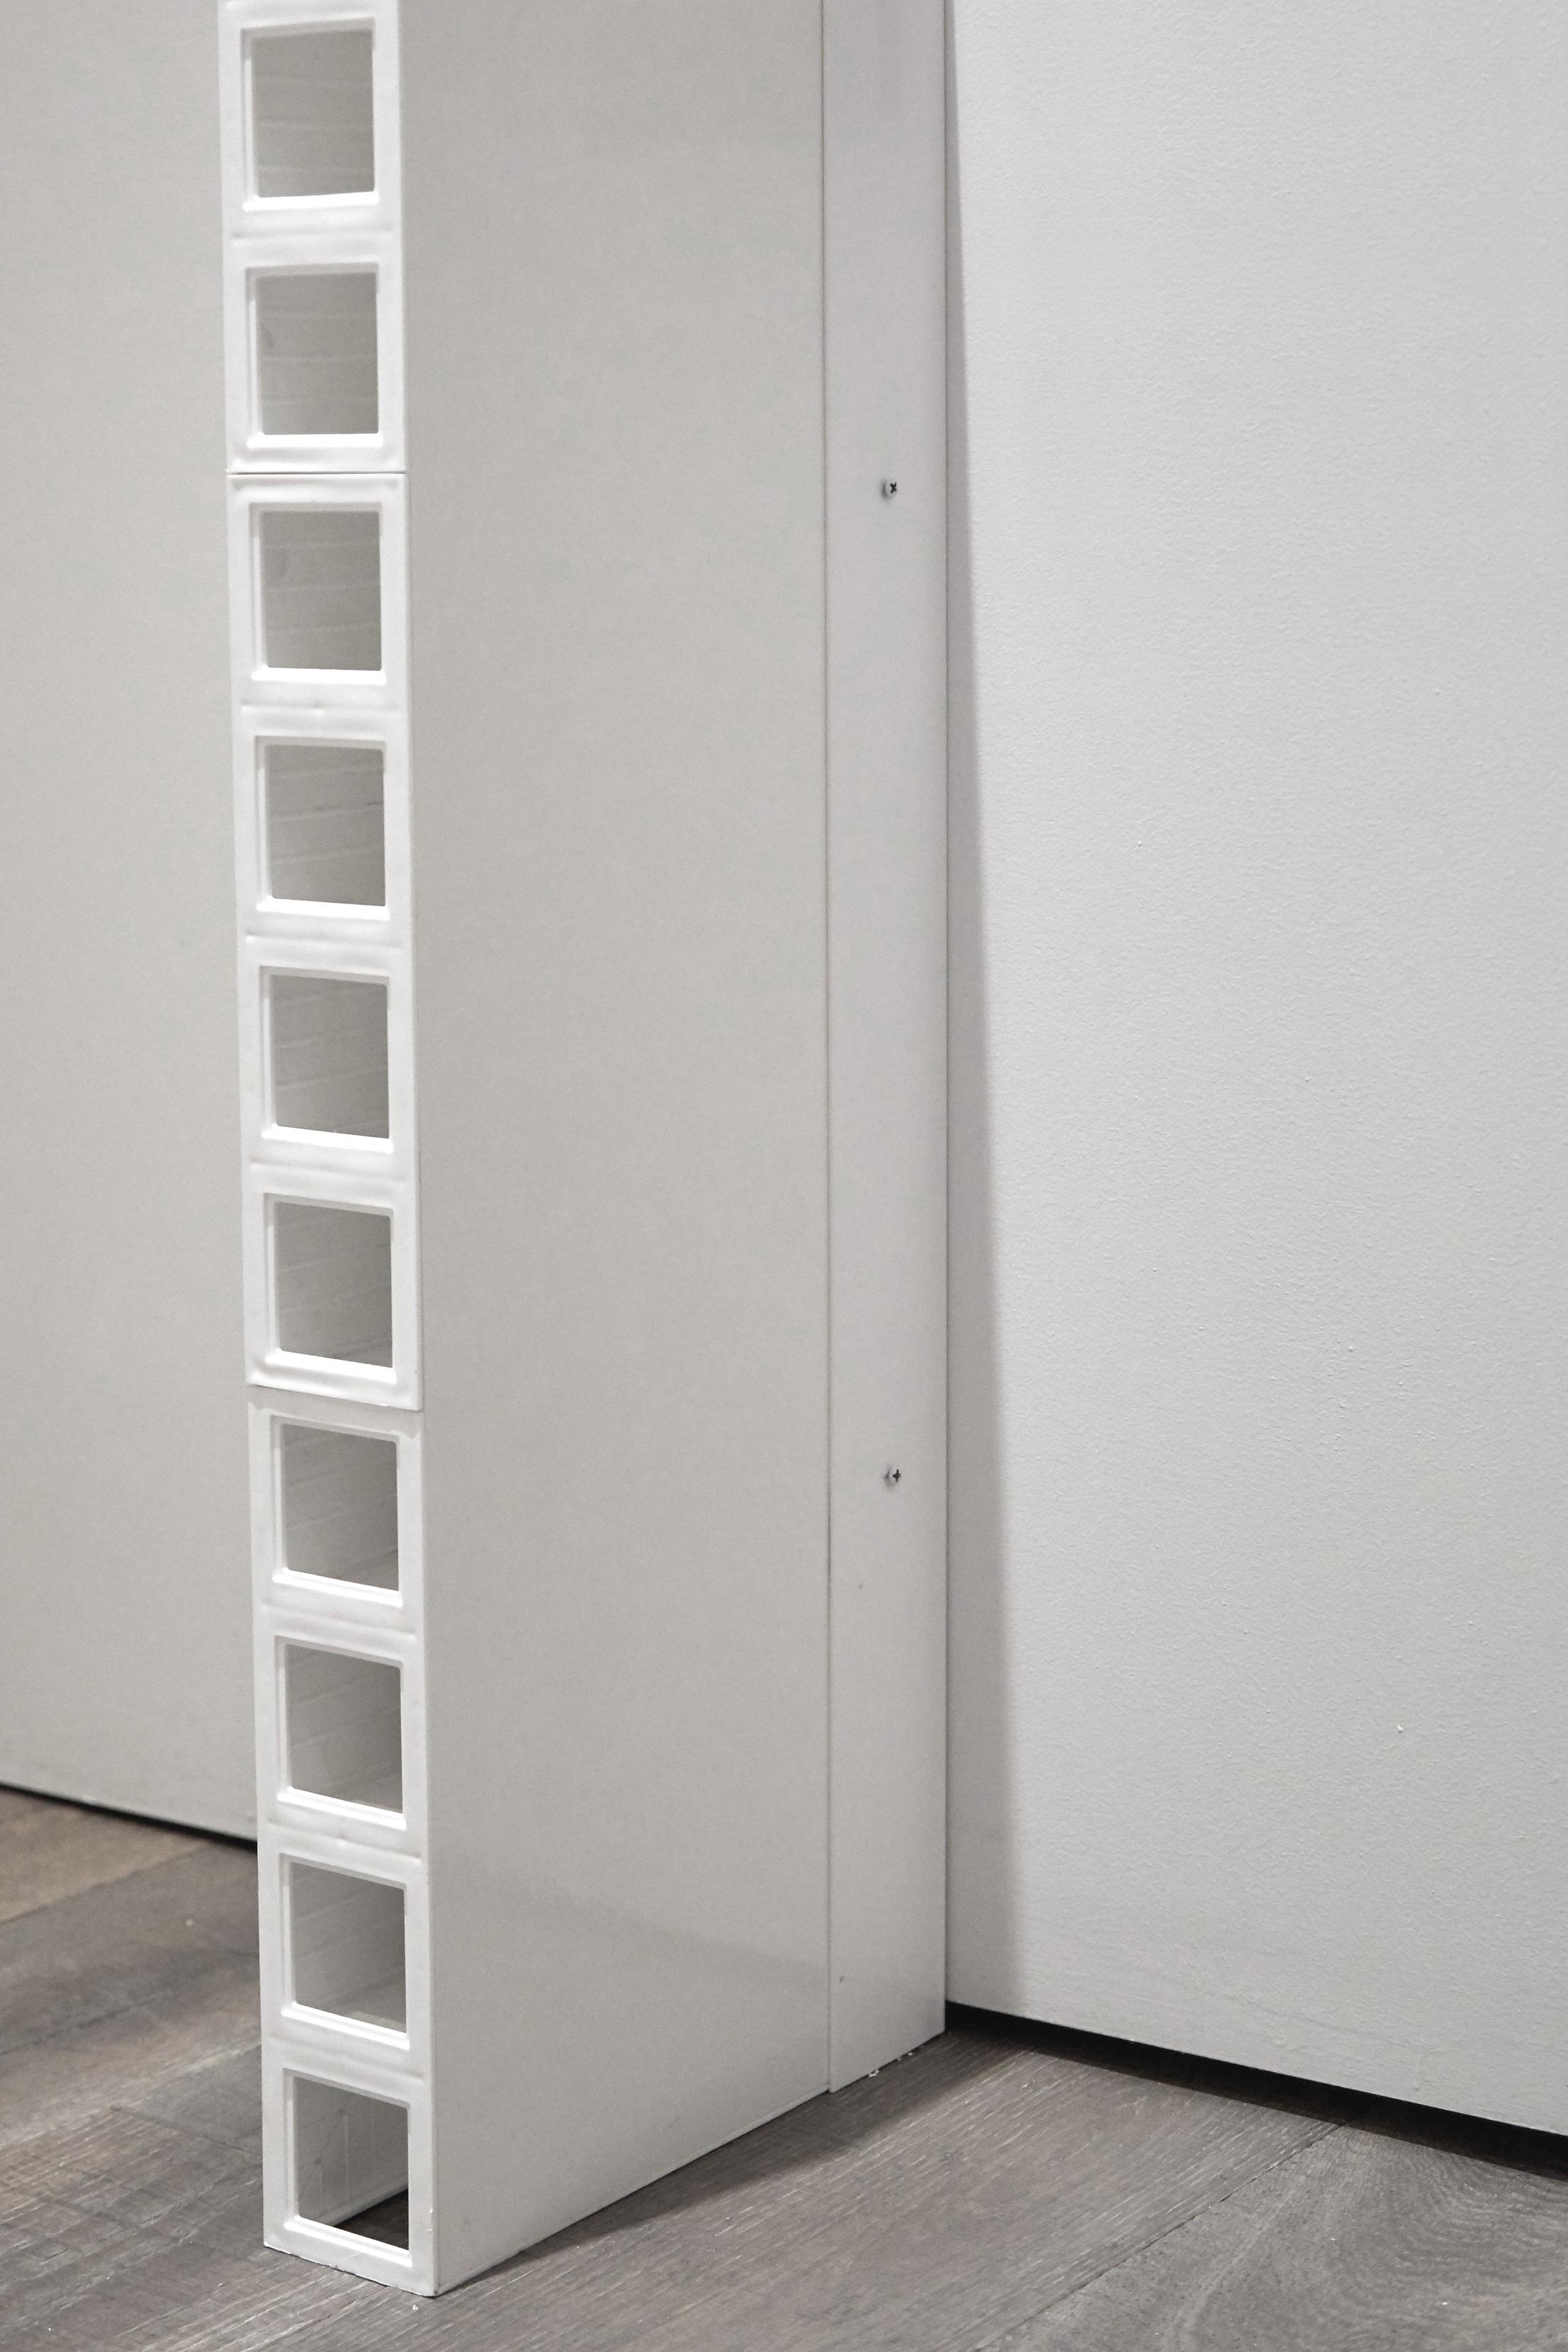 Fastening+modular+wall+panel